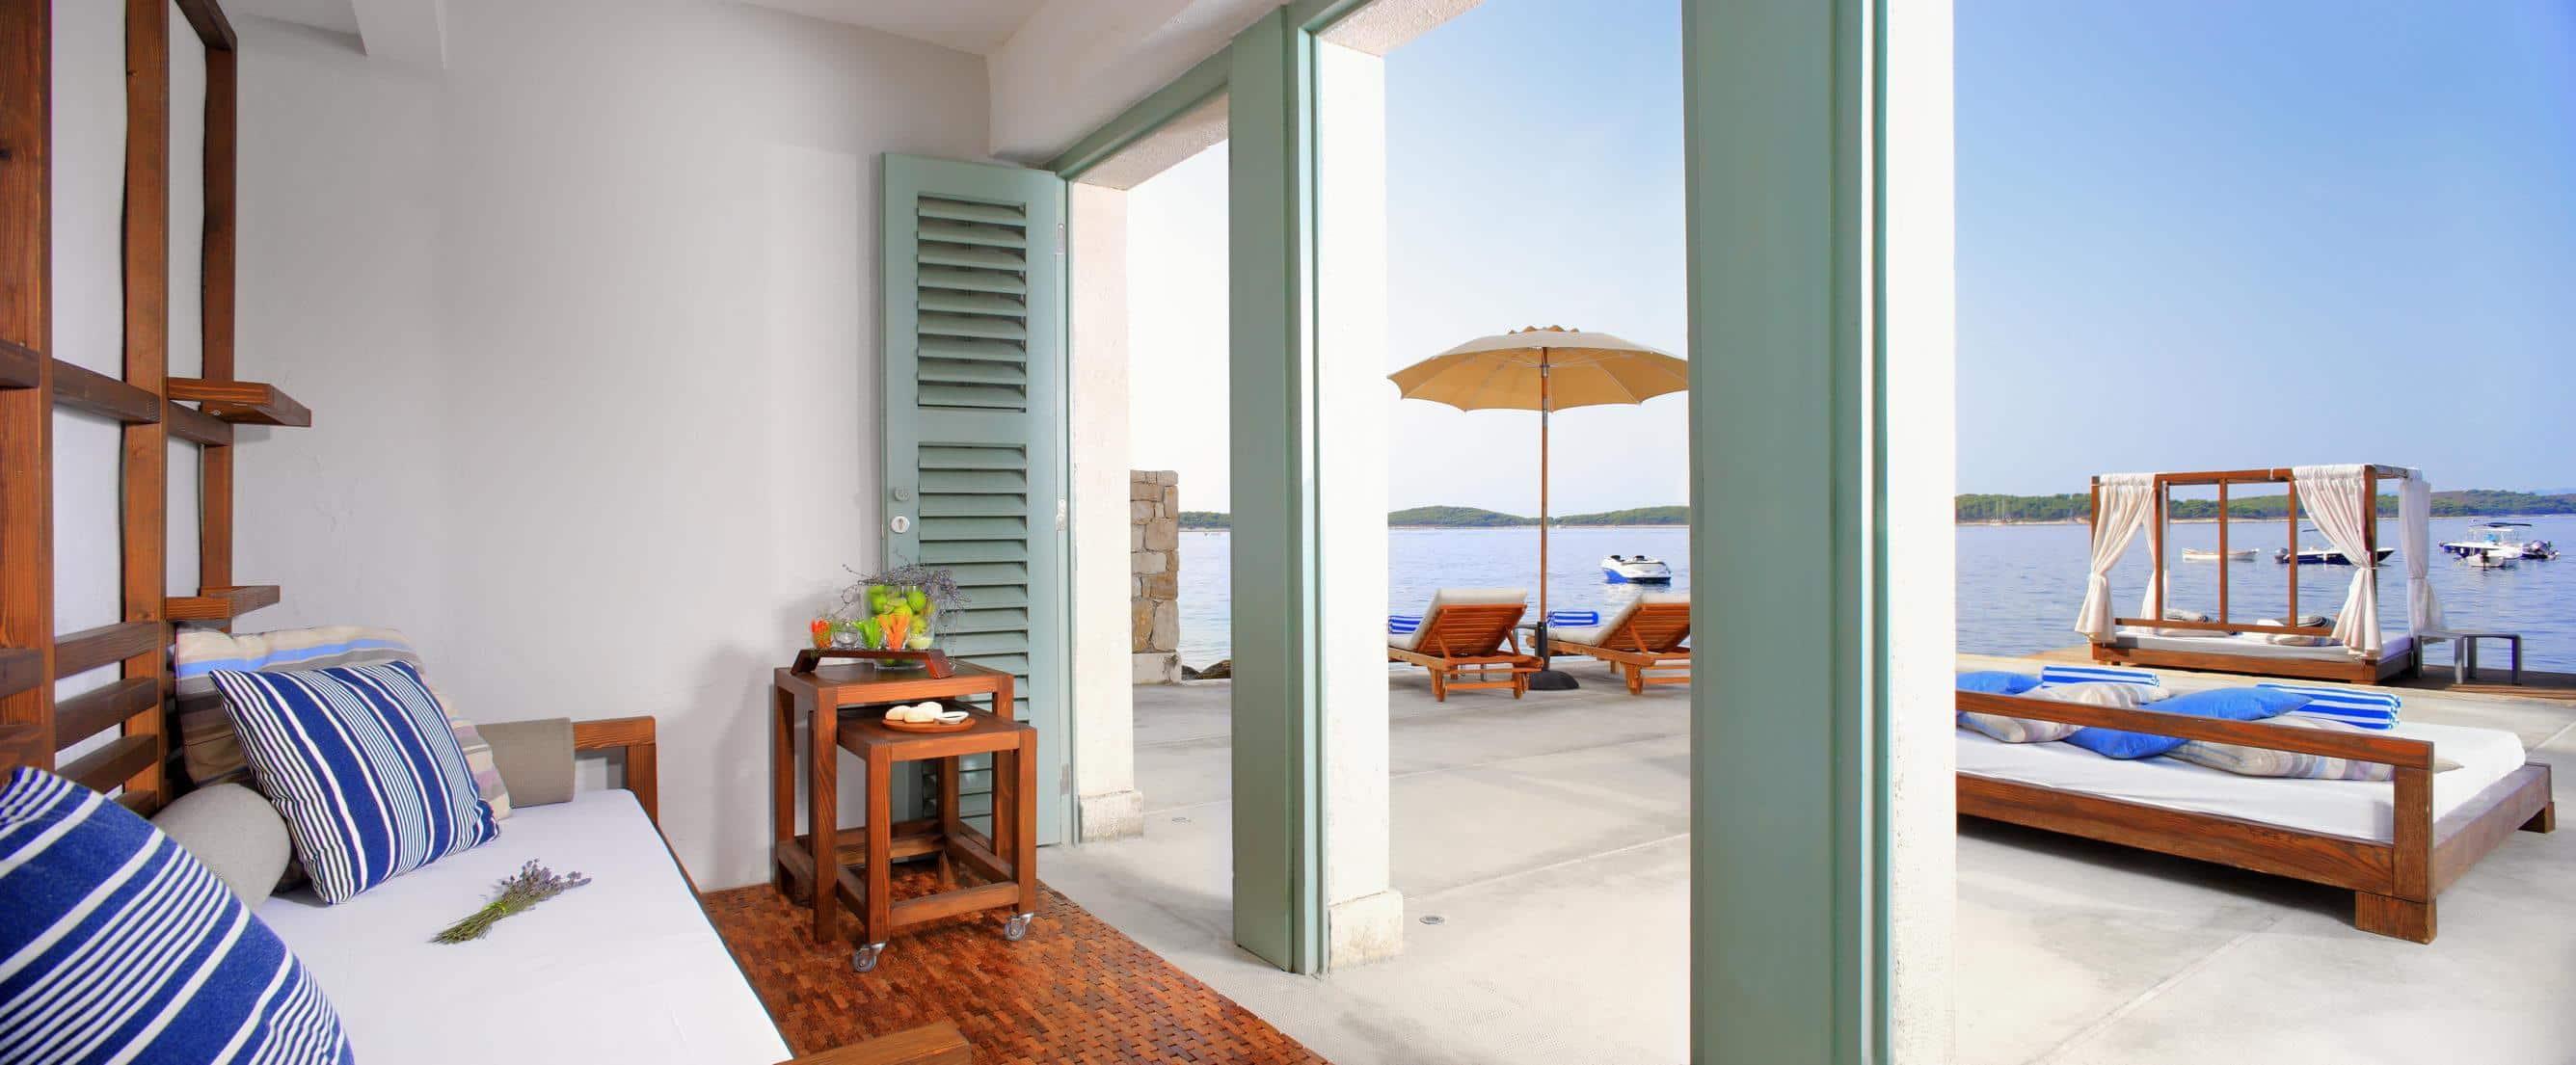 Amfora, Hvar grand beach resort 11